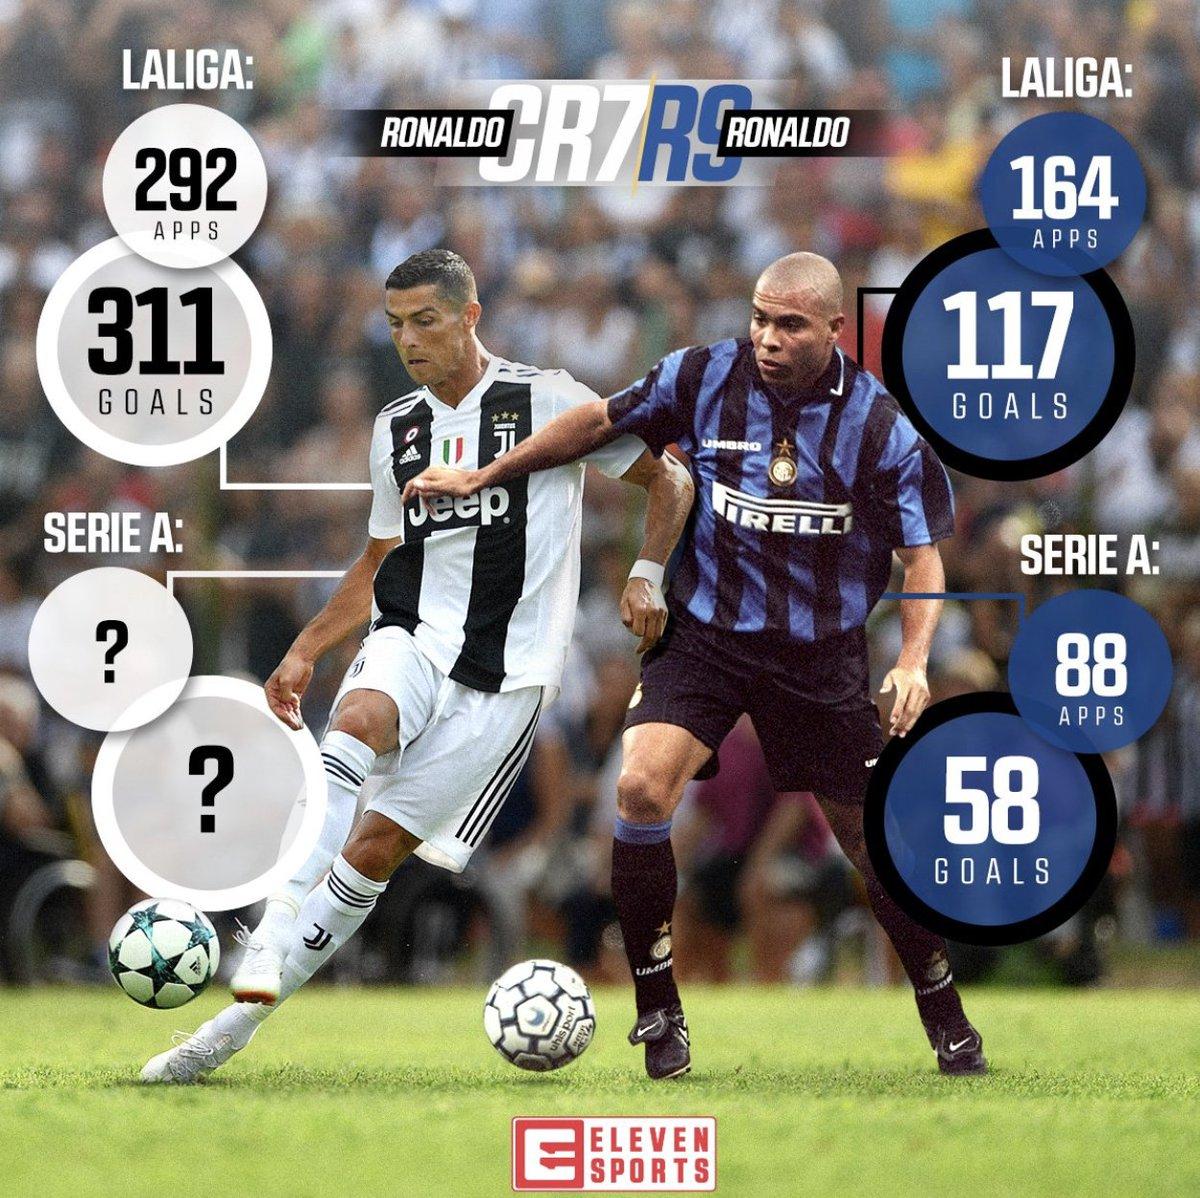 Kommander watch | Juventus Edition  - Page 2 DlOPiJvXoAEr6mw?format=jpg